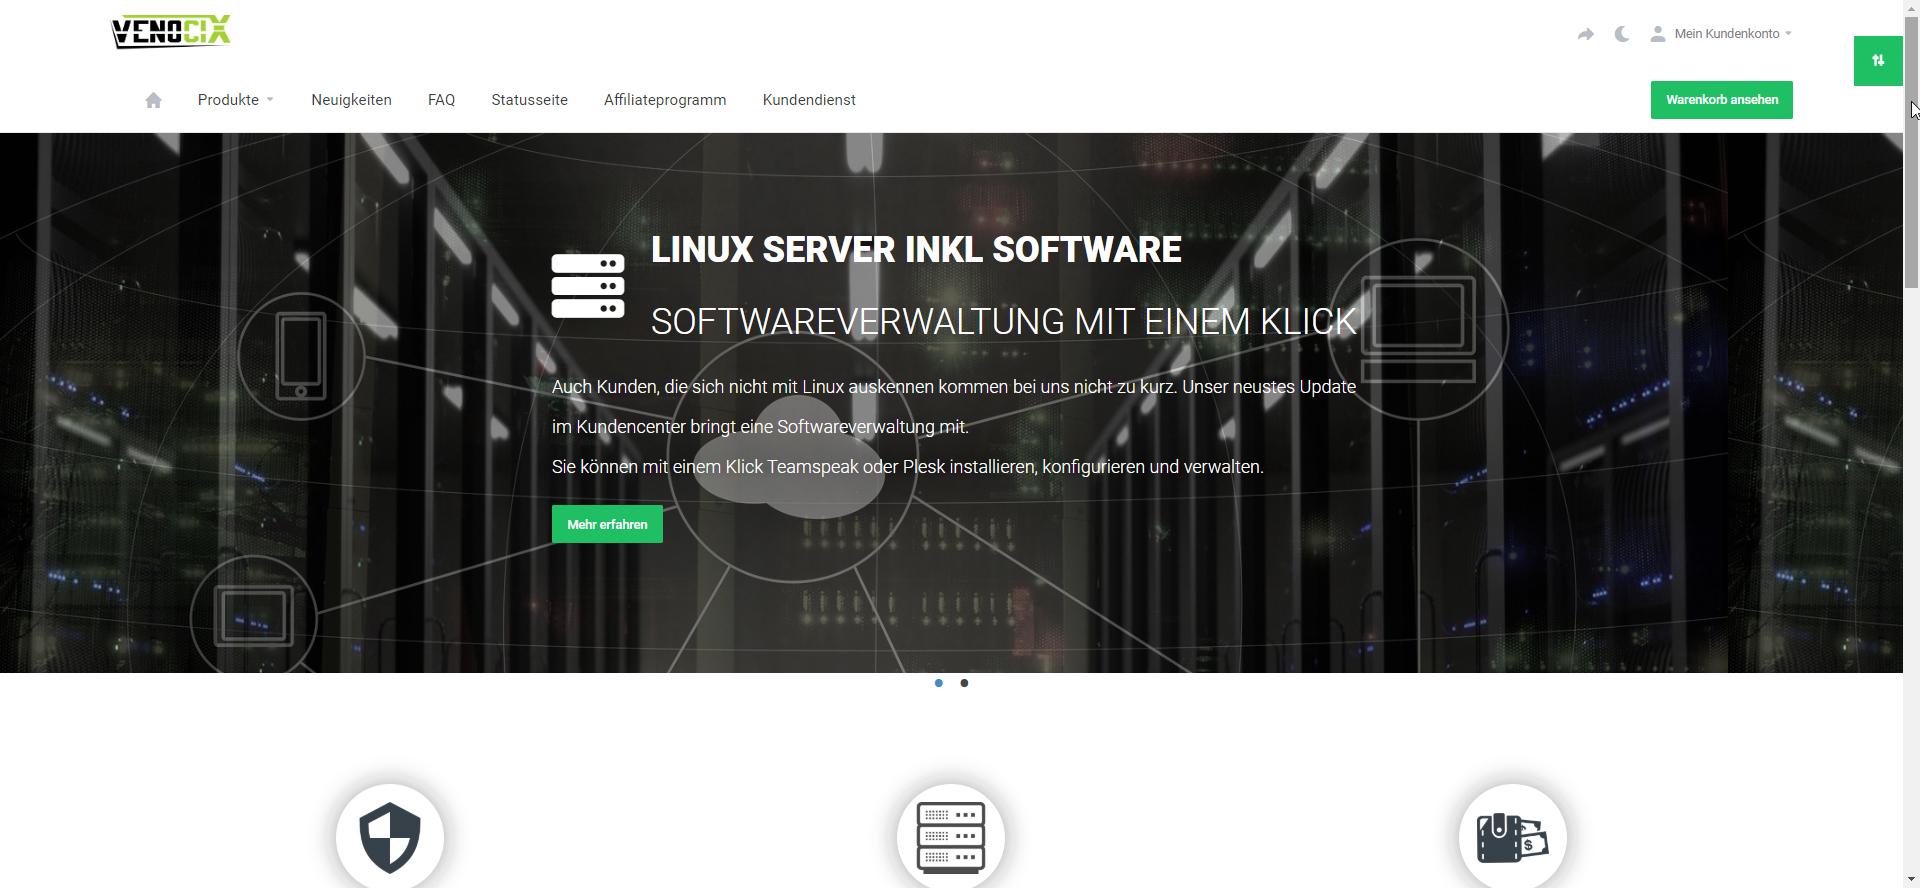 KVM/Root/VPS Server - vServer Special - 2 Kerne - 8 GB RAM - 75 GB SSD - 10 Gbit - Prepaid